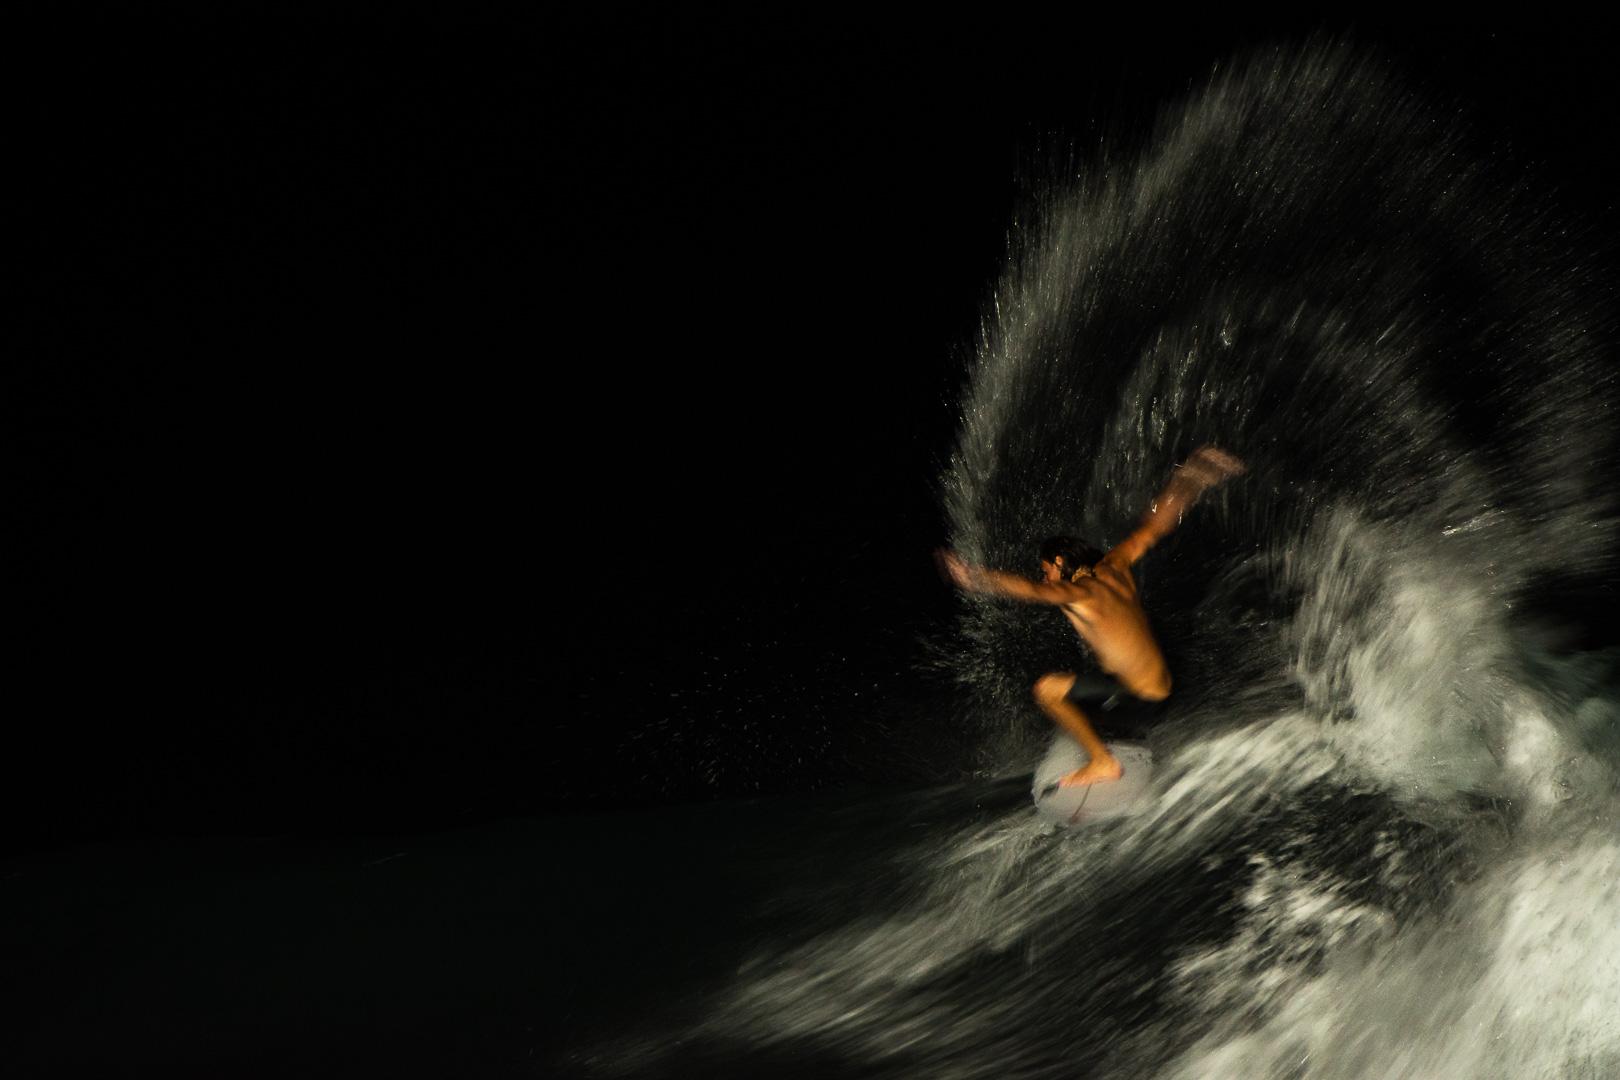 Kipp Caddy night surfing at Keramas.